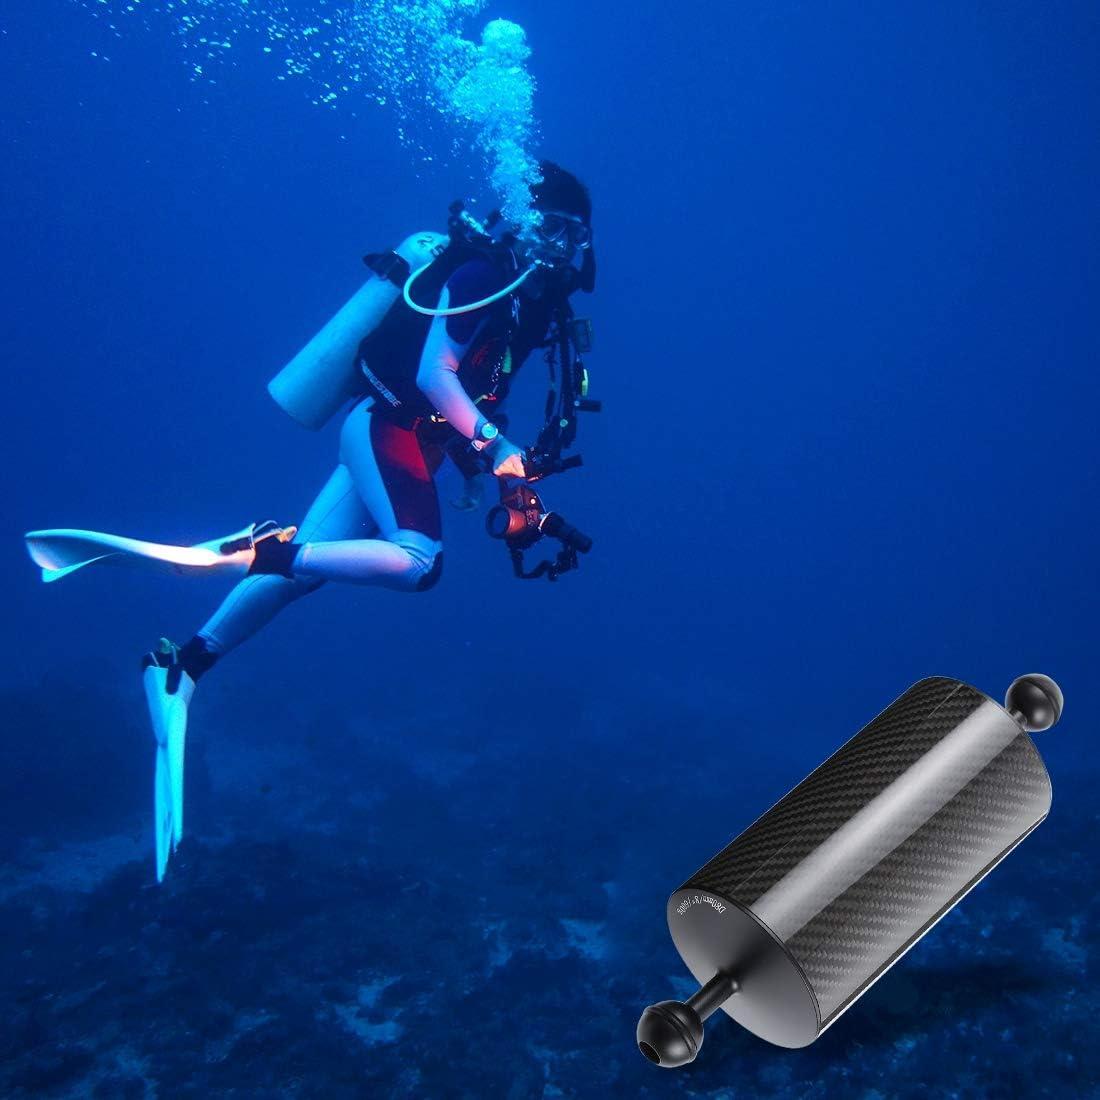 Ball Diameter Buoyancy 25mm 30m Underwater Lighting 9.84 inch 25cm Length 80mm Diameter Dual Balls Carbon Fiber Floating Arm 600g Diving Acc